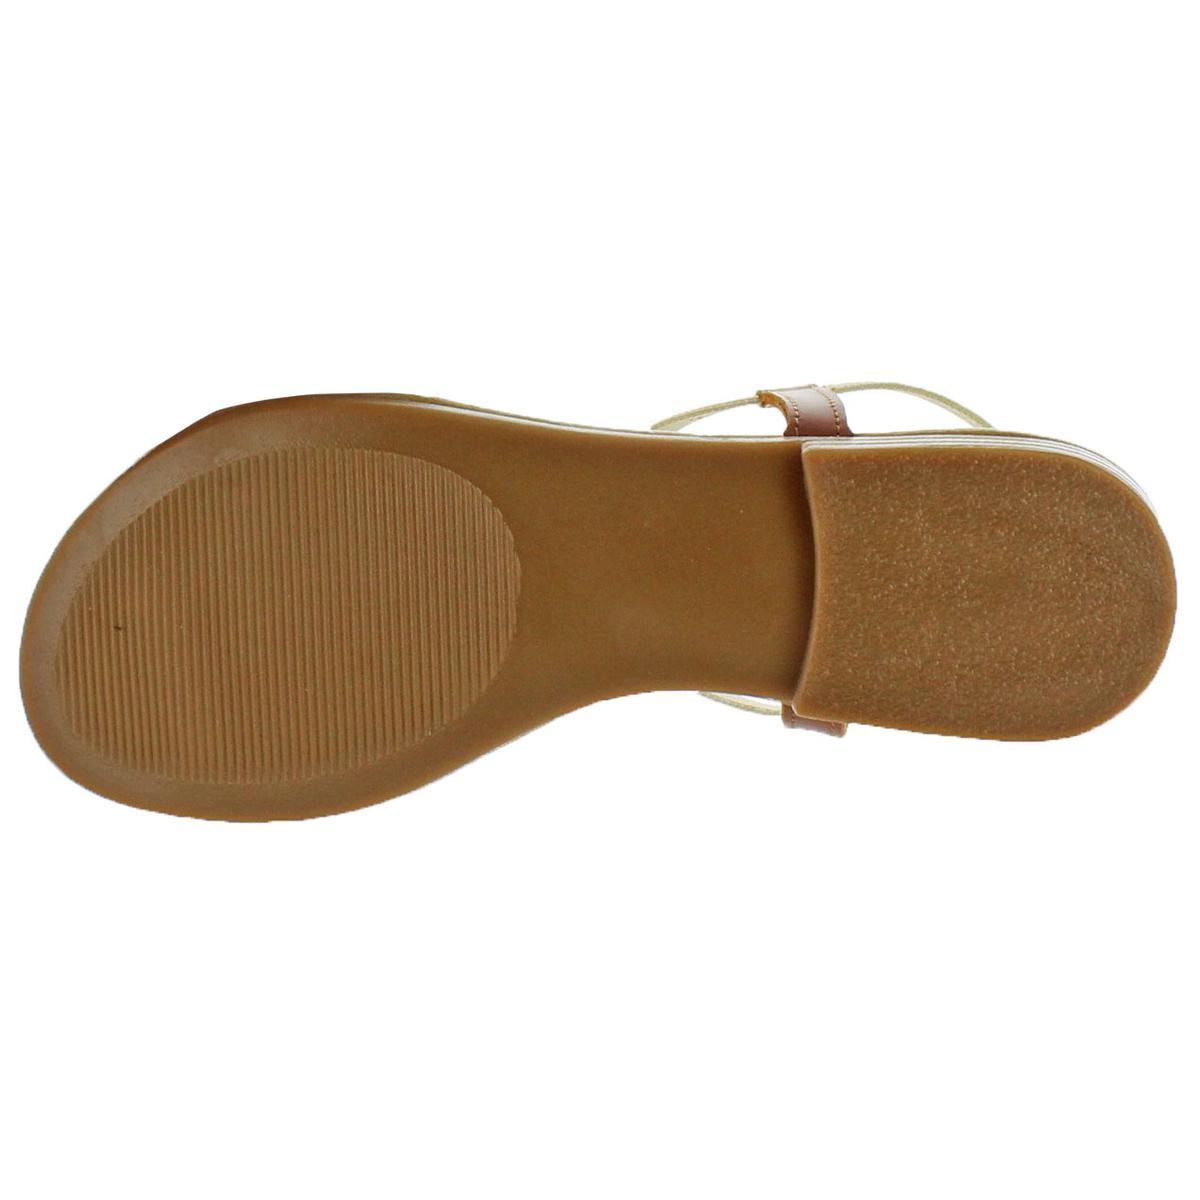 Steve-Madden-Women-039-s-Synergy-Leather-Thong-T-Strap-Sandals thumbnail 5